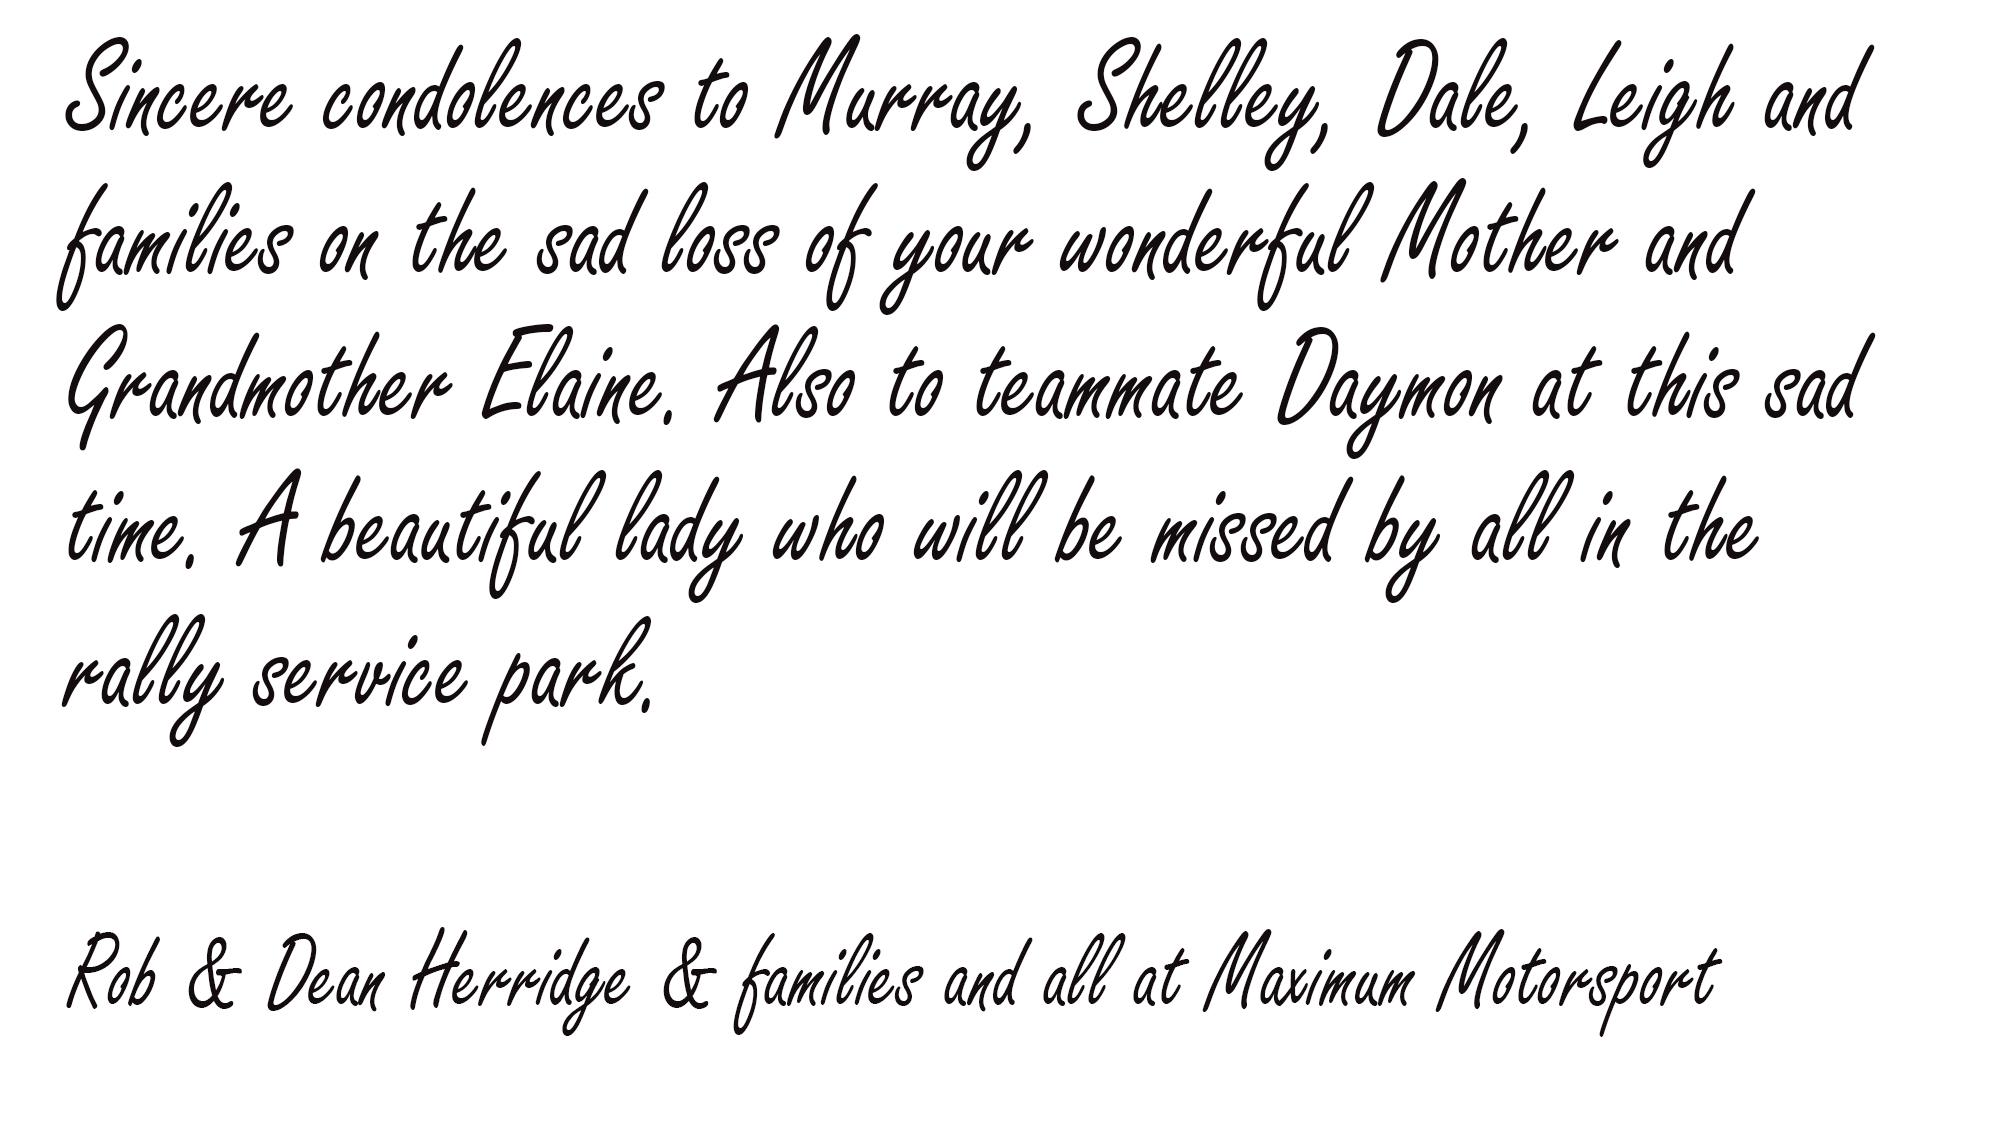 ob & Dean Herridge & families and all at Maximum Motorsport